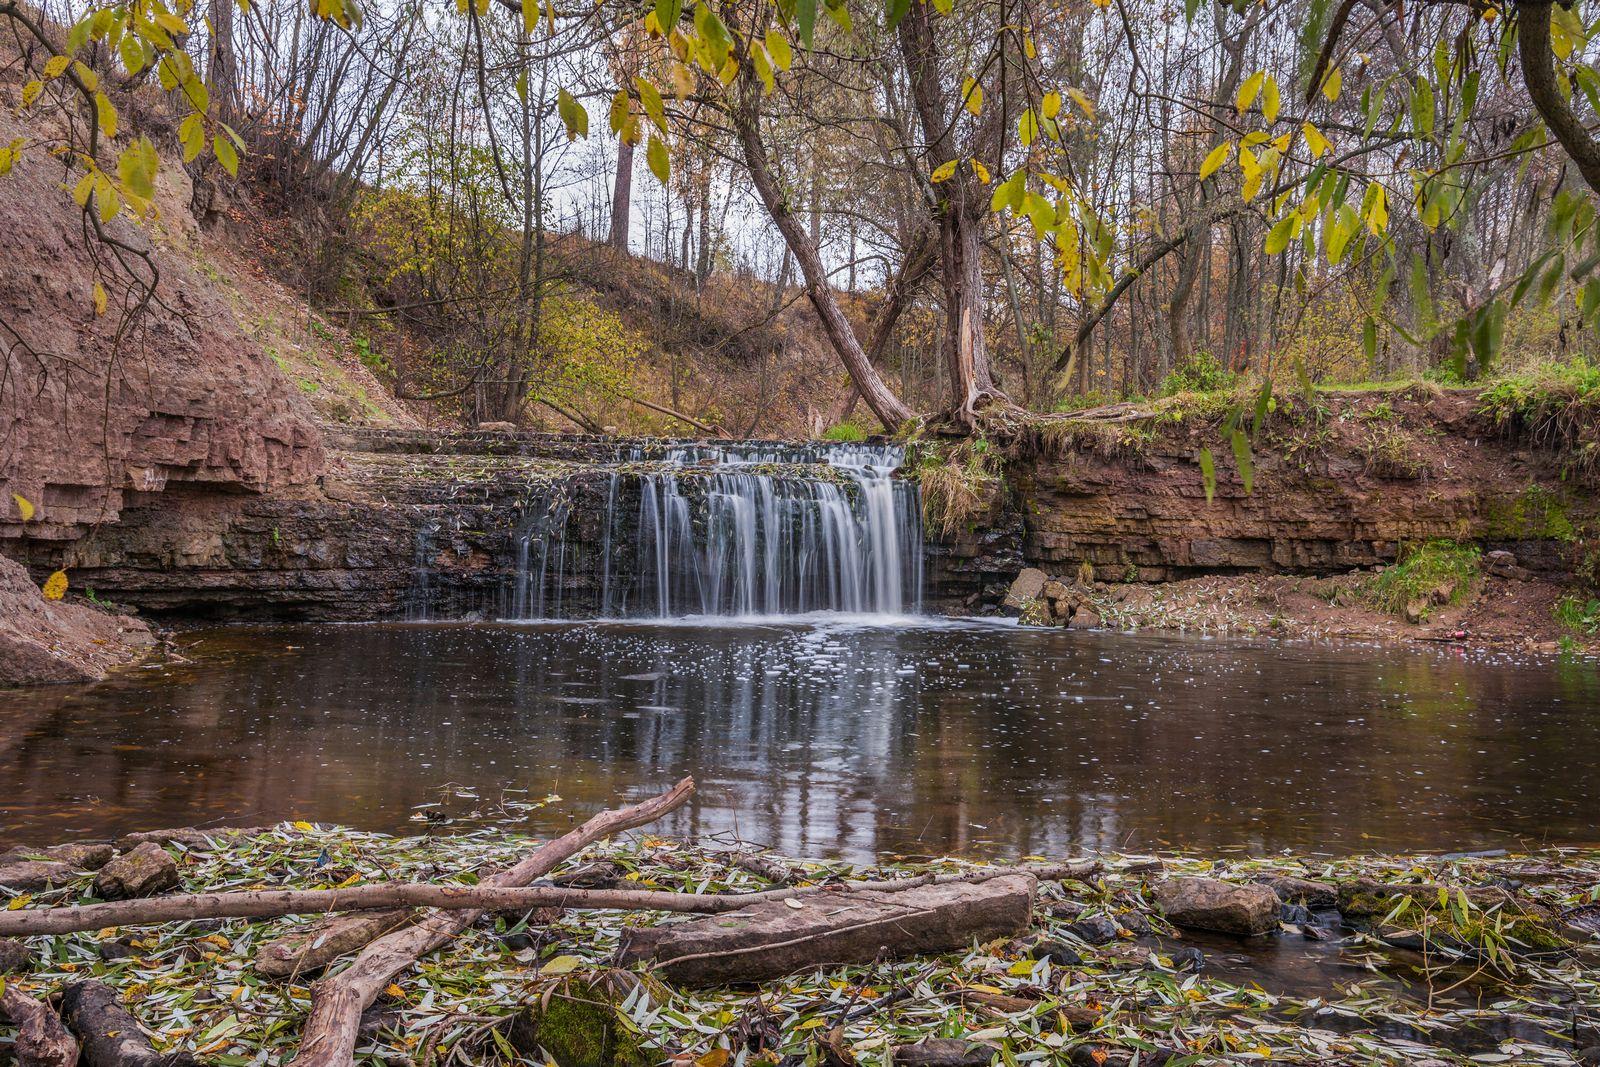 Водопад на реке Саблинка. Водопад на реке Саблинка река водопады Ленинградской области